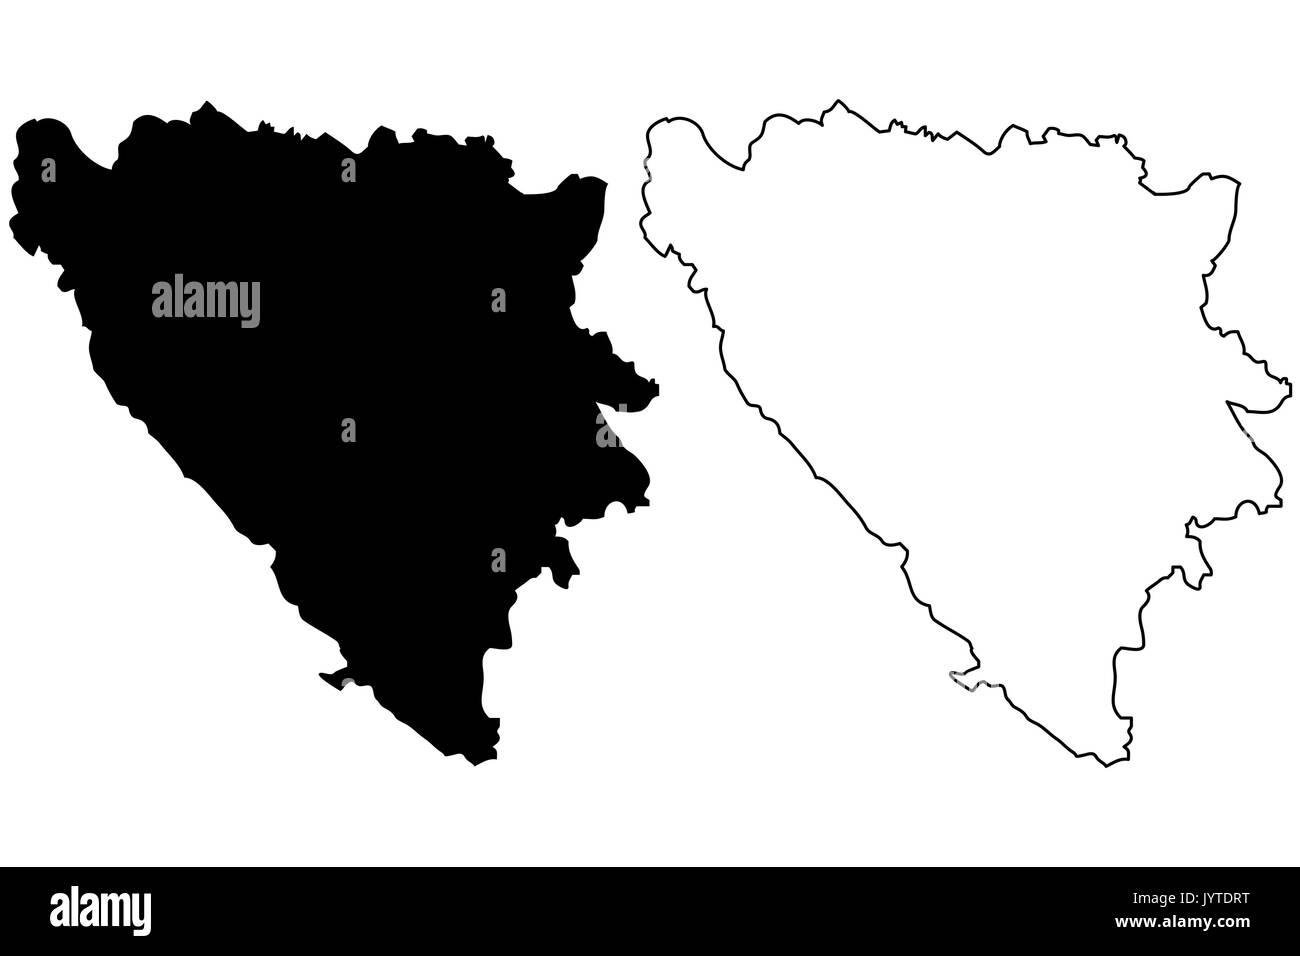 Bosnia and Herzegovina map vector illustration, scribble sketch Bosnia and Herzegovina - Stock Image